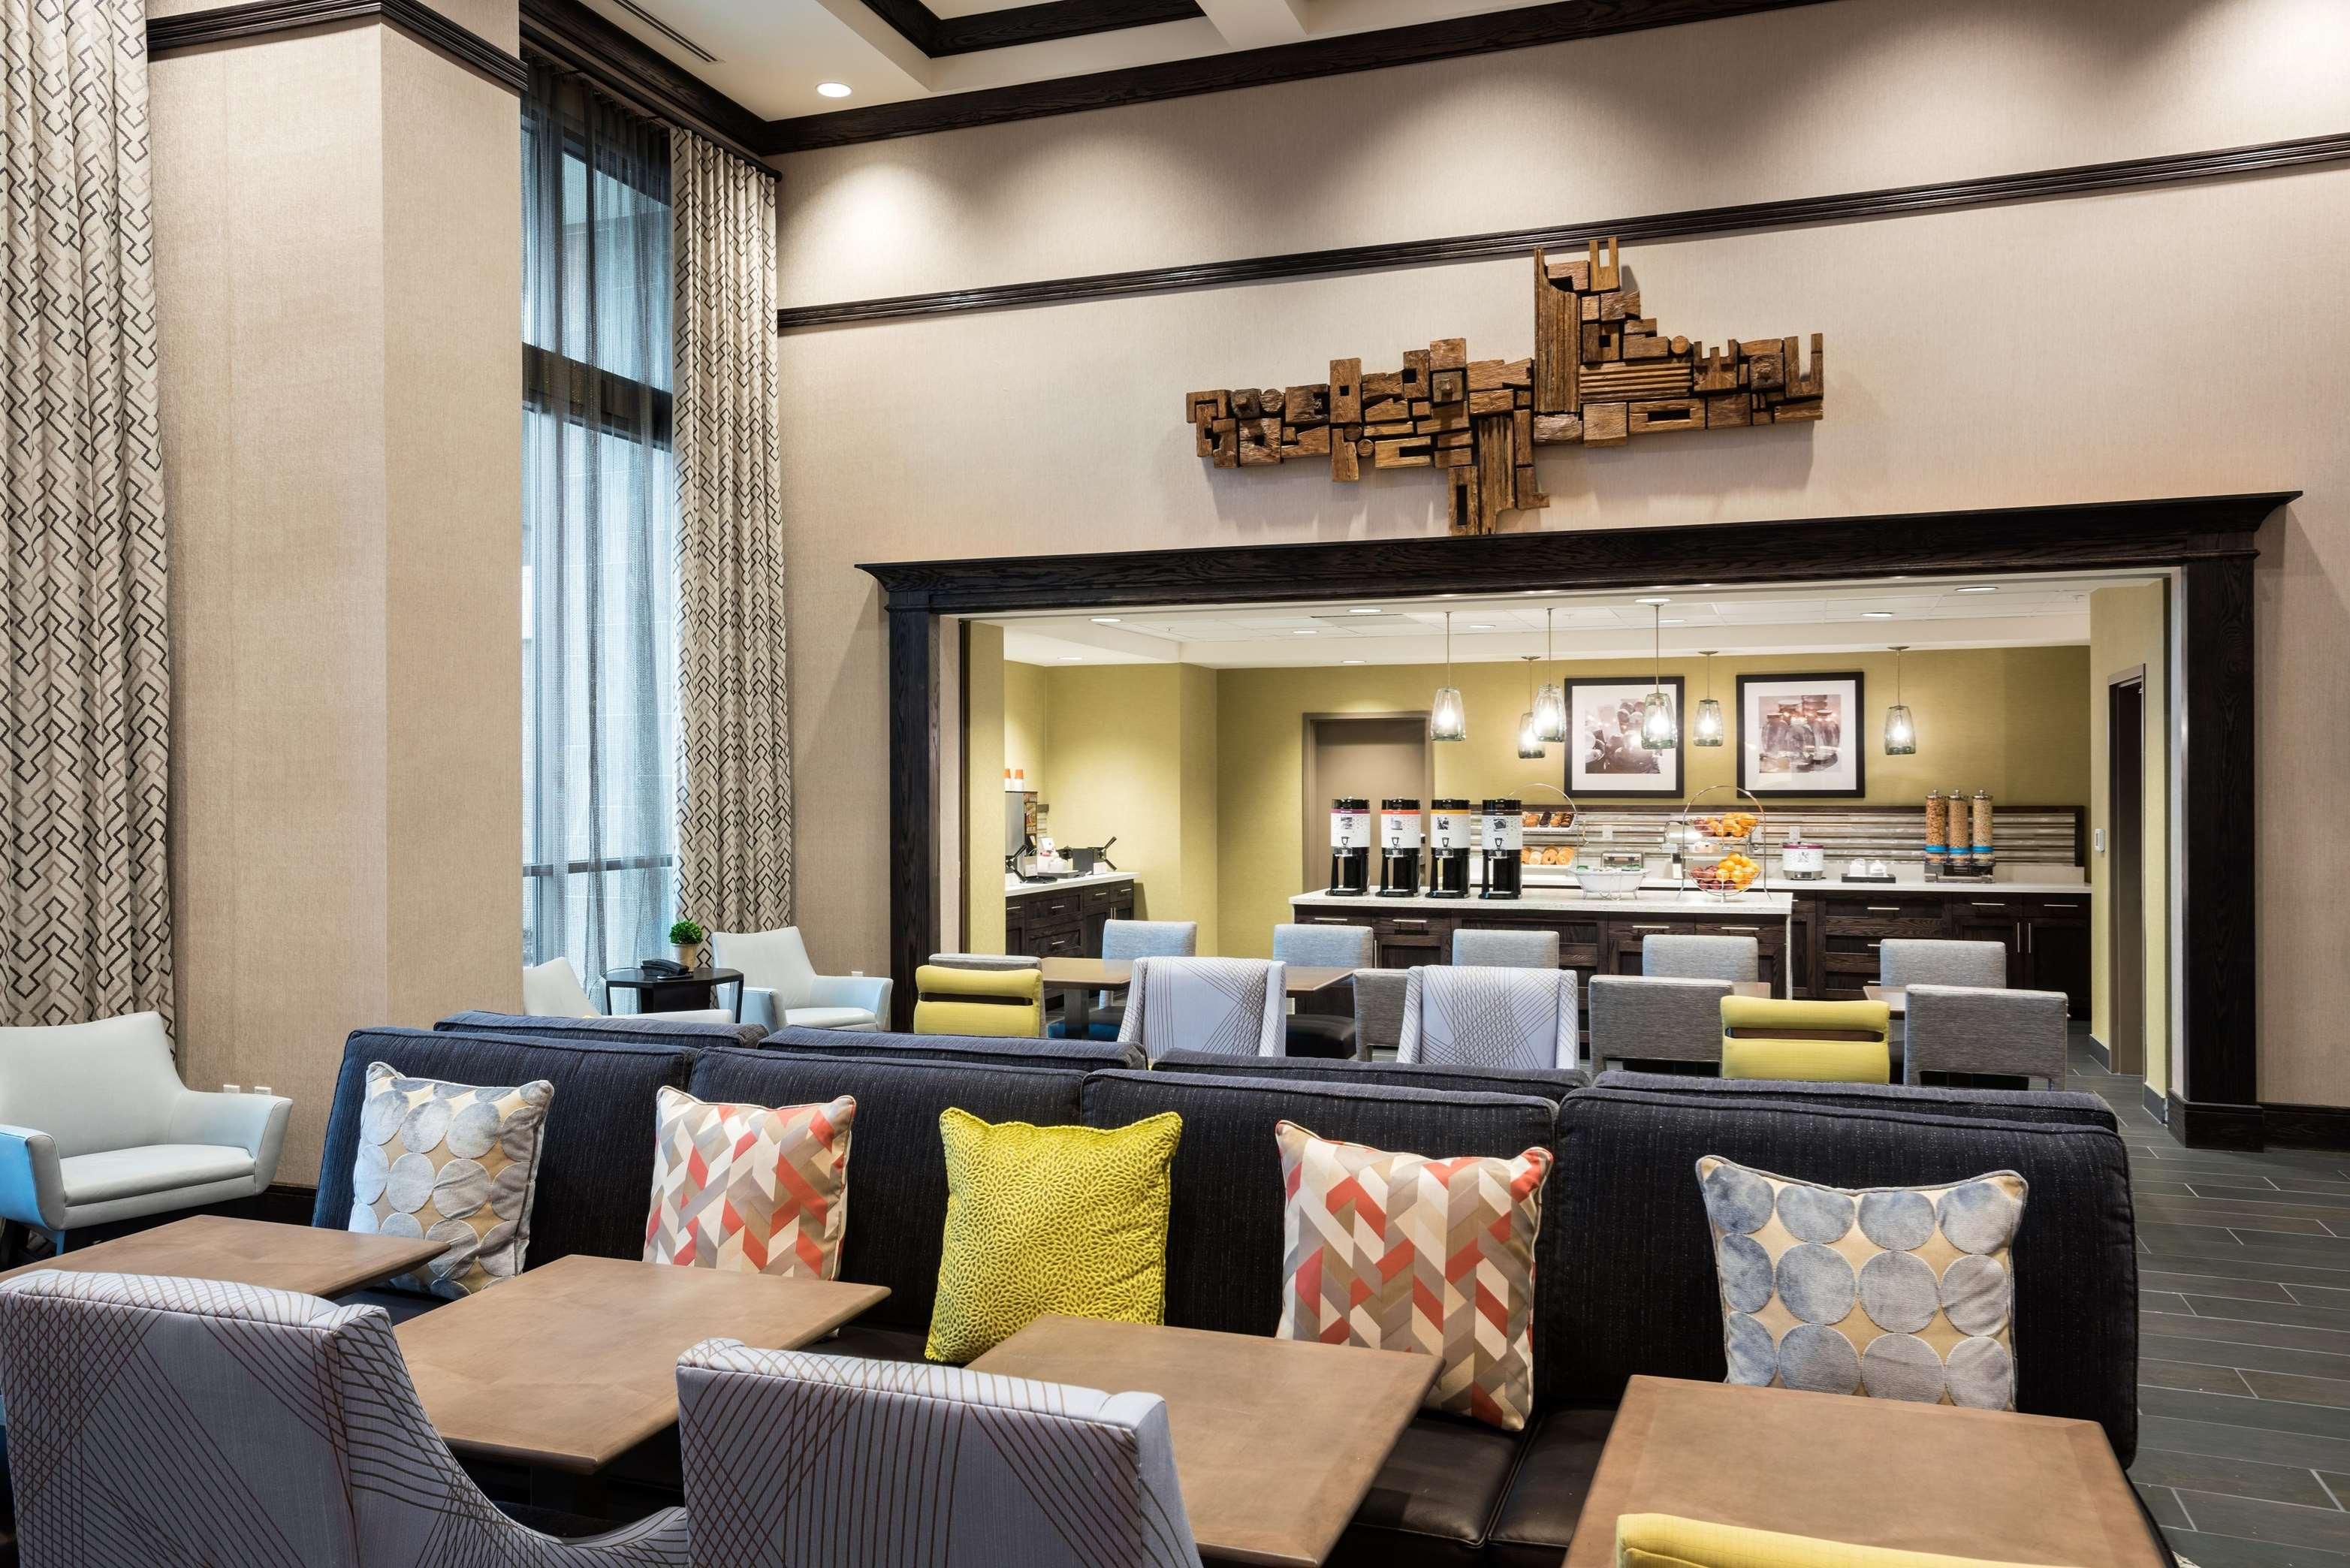 Hampton Inn & Suites Napa image 9